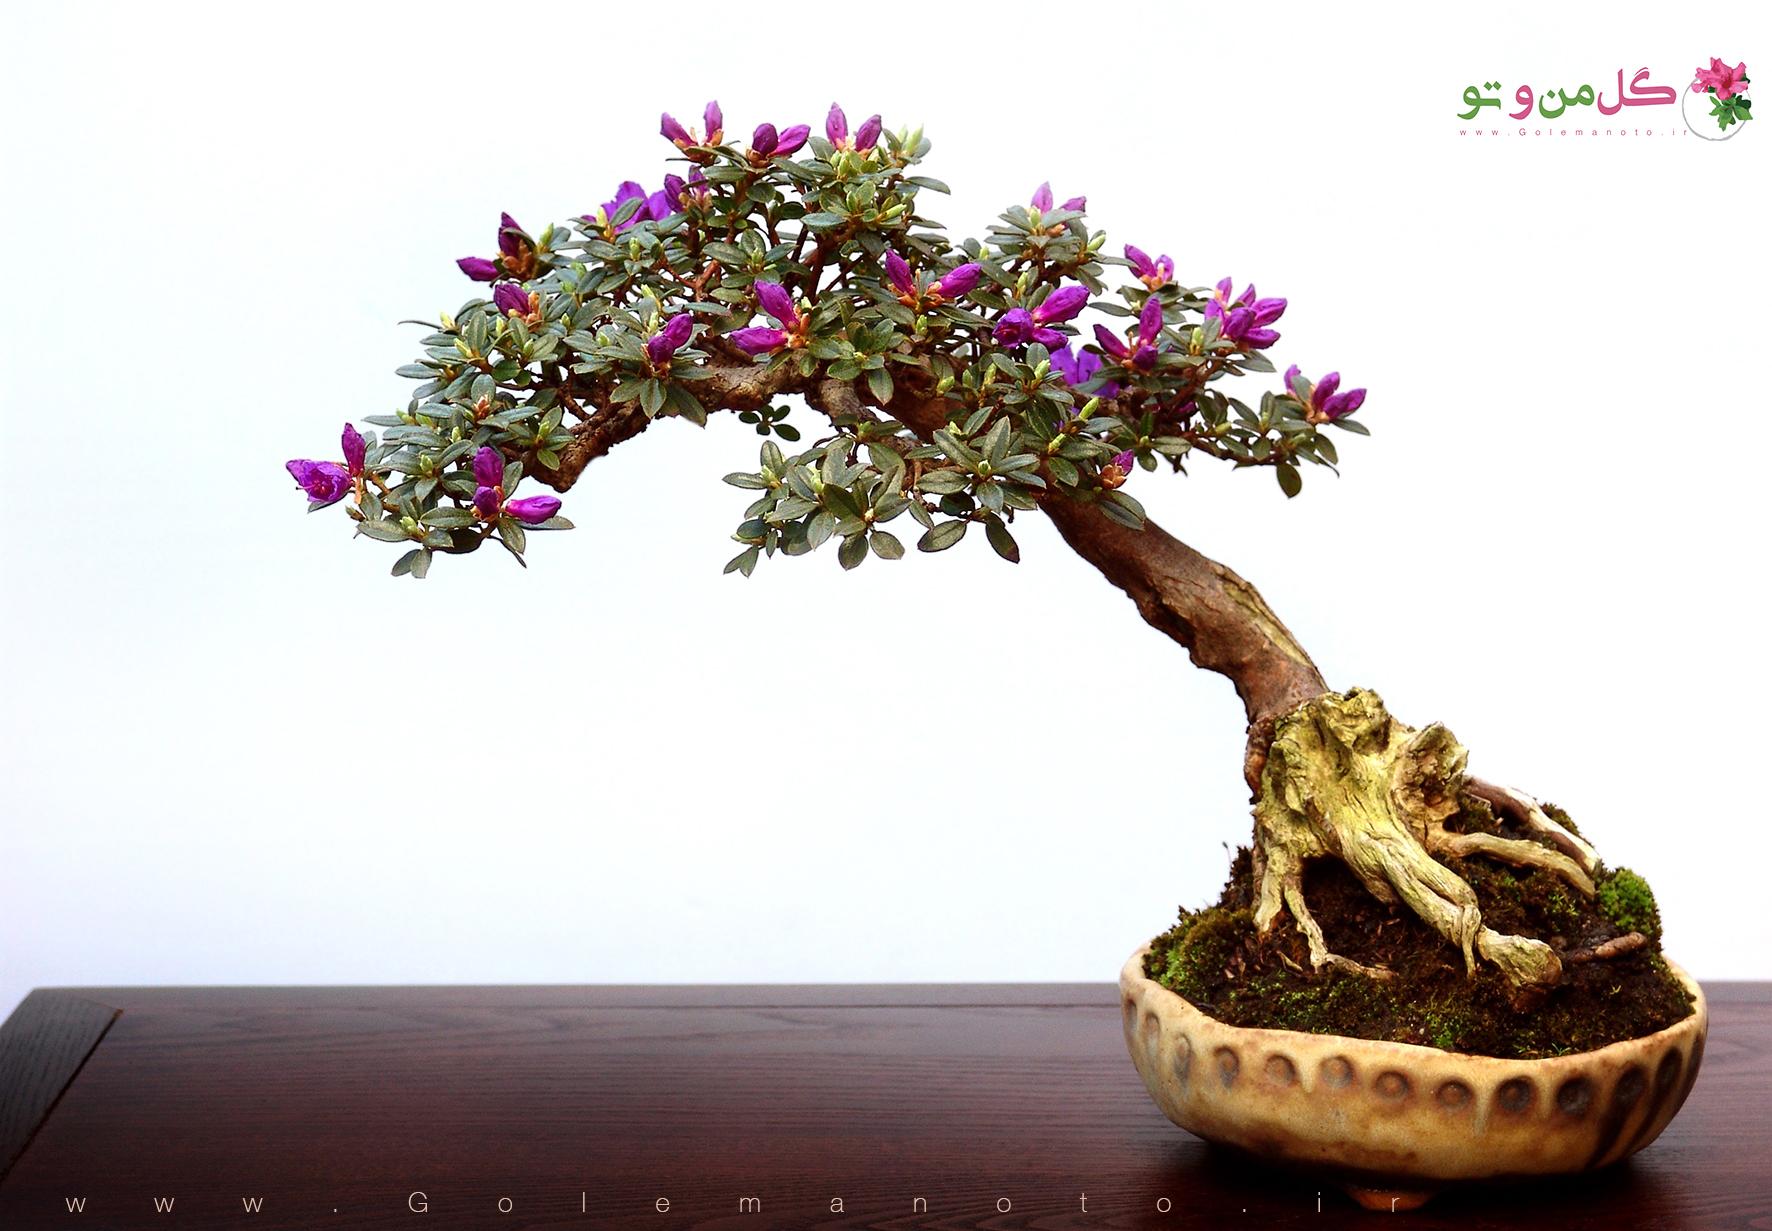 bonsai tree small leaves نکات مهم هنگام خرید بنسای(بونسای)